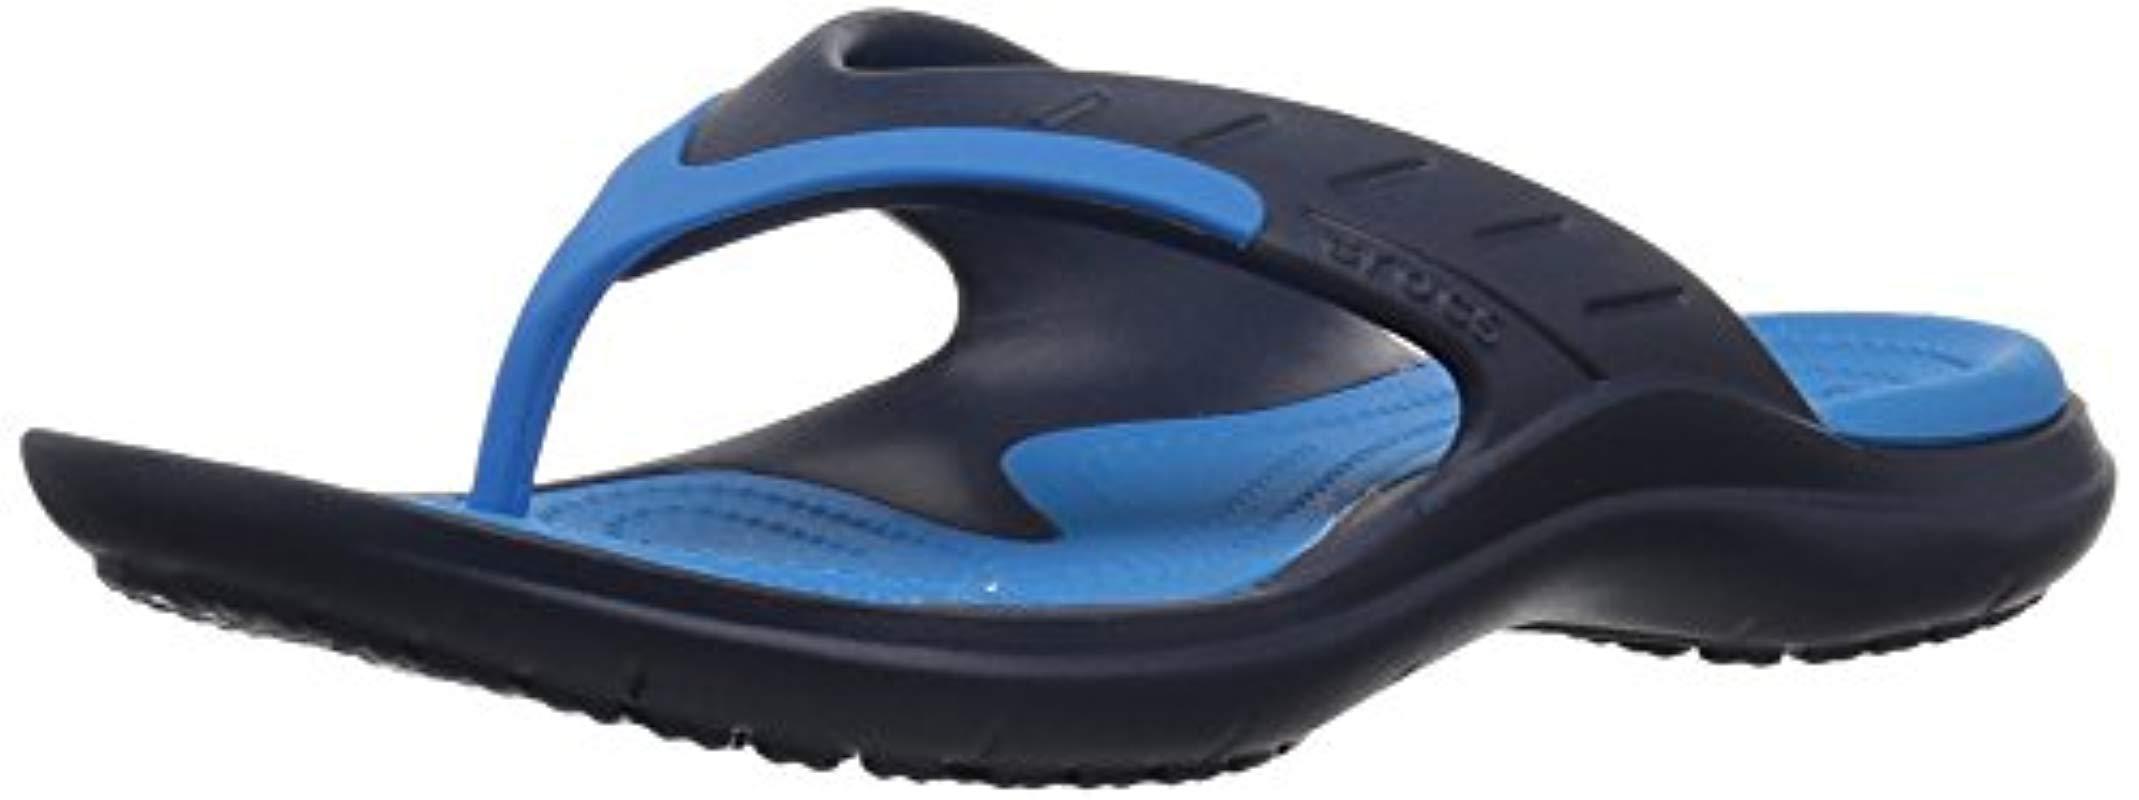 fd7f2c886 Crocs™. Blue Unisex Modi Sport Flip Flops